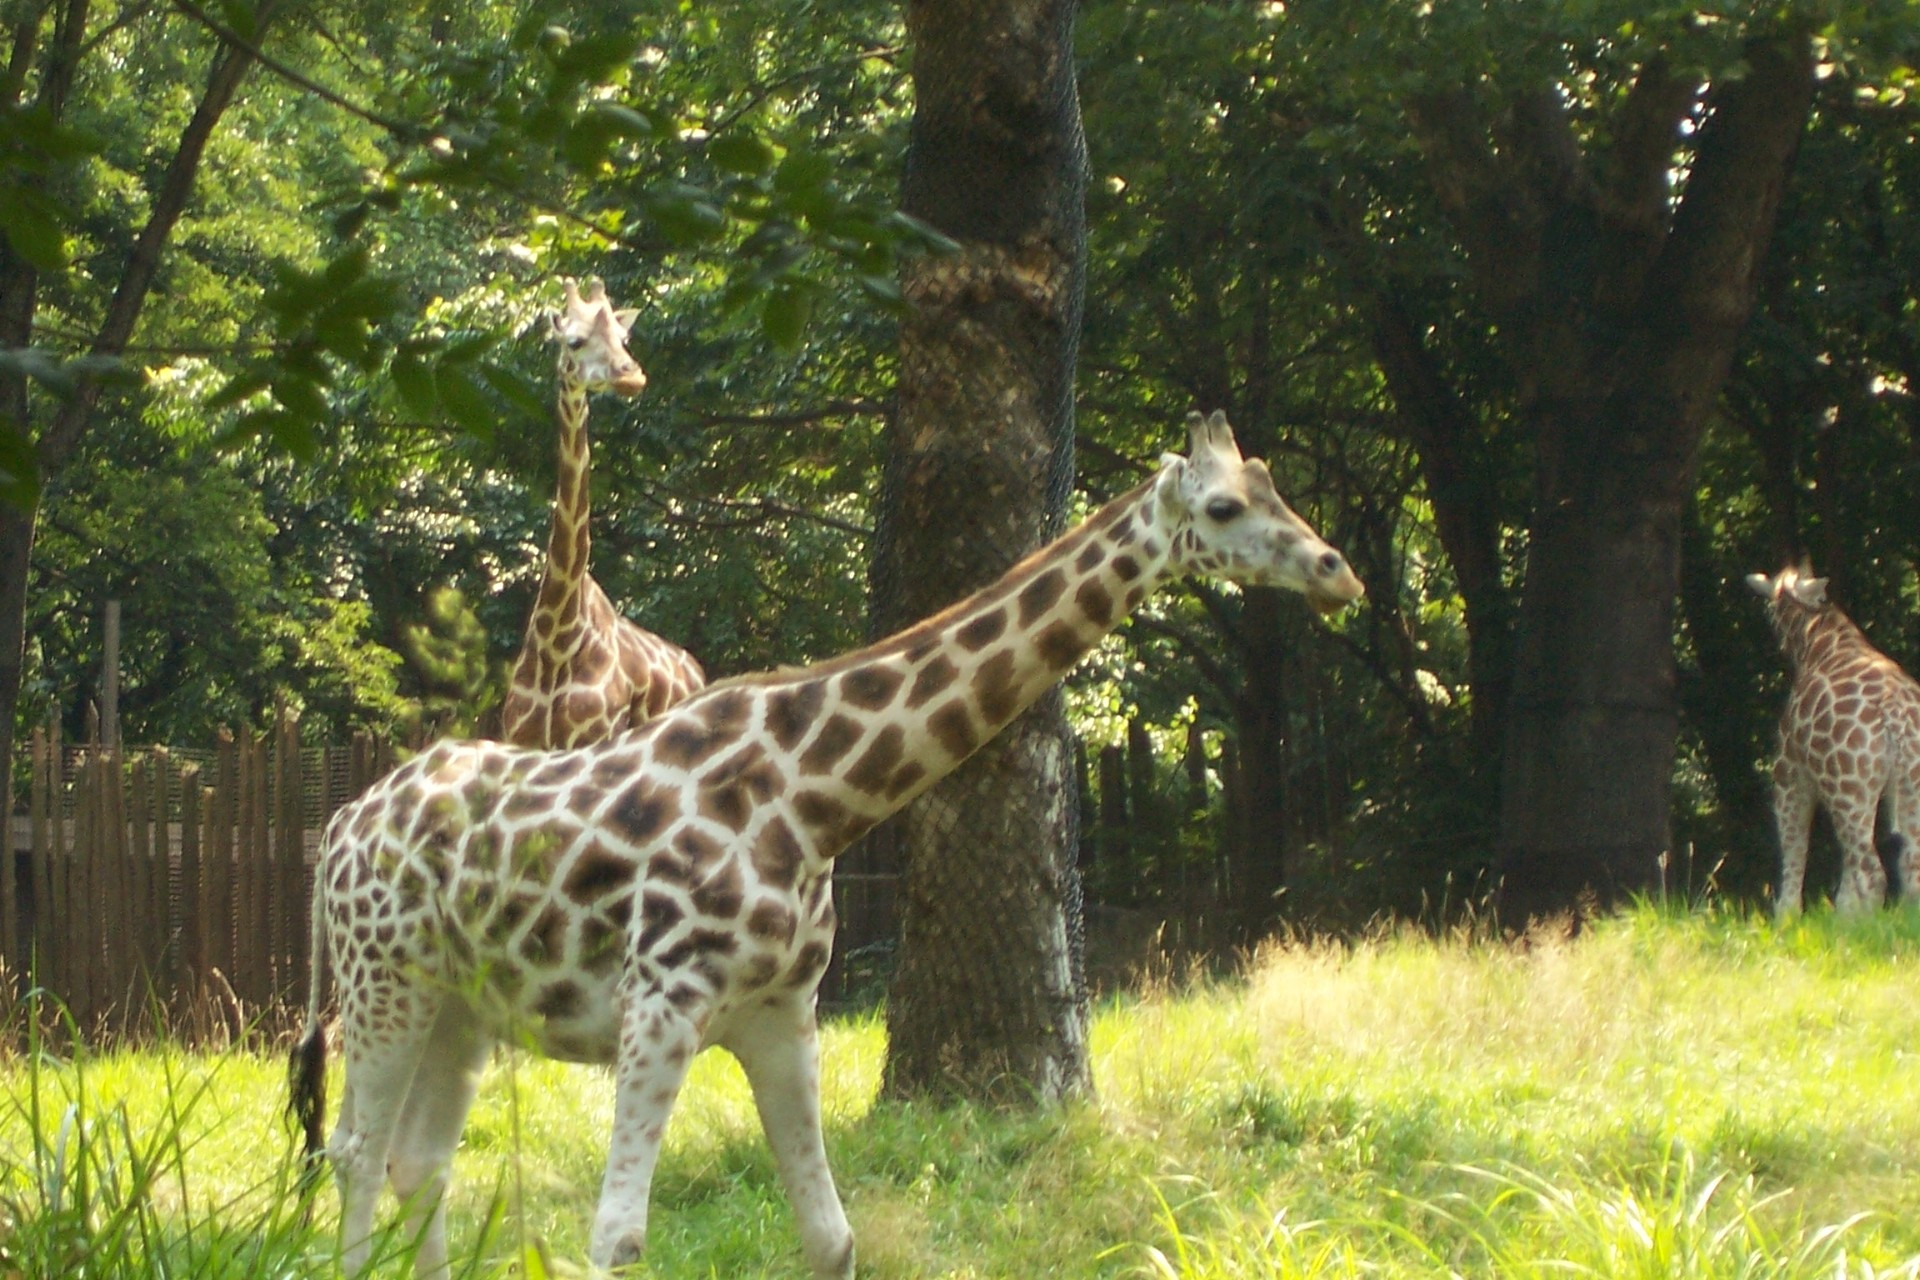 Animals, Zoo: https://lookfordiagnosis.com/mesh_info.php?term=Animals%2C+Zoo&lang=1